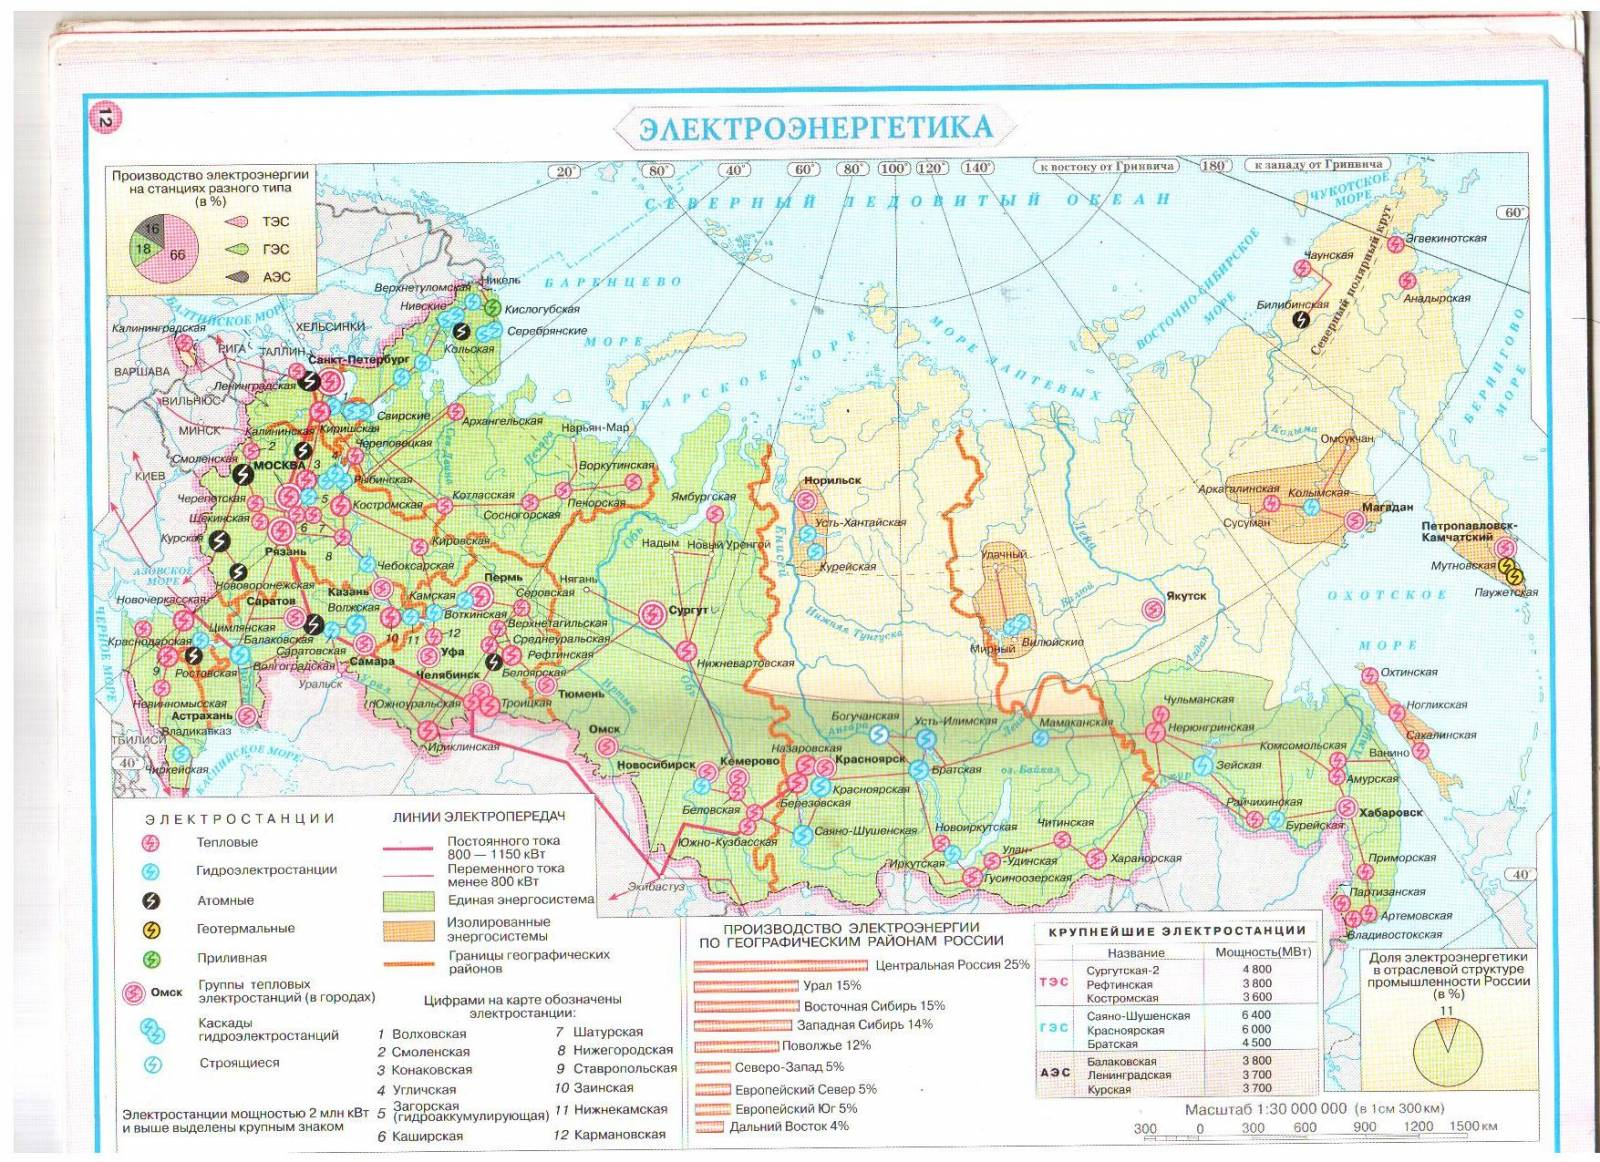 гдз карта электроэнергетика контурная